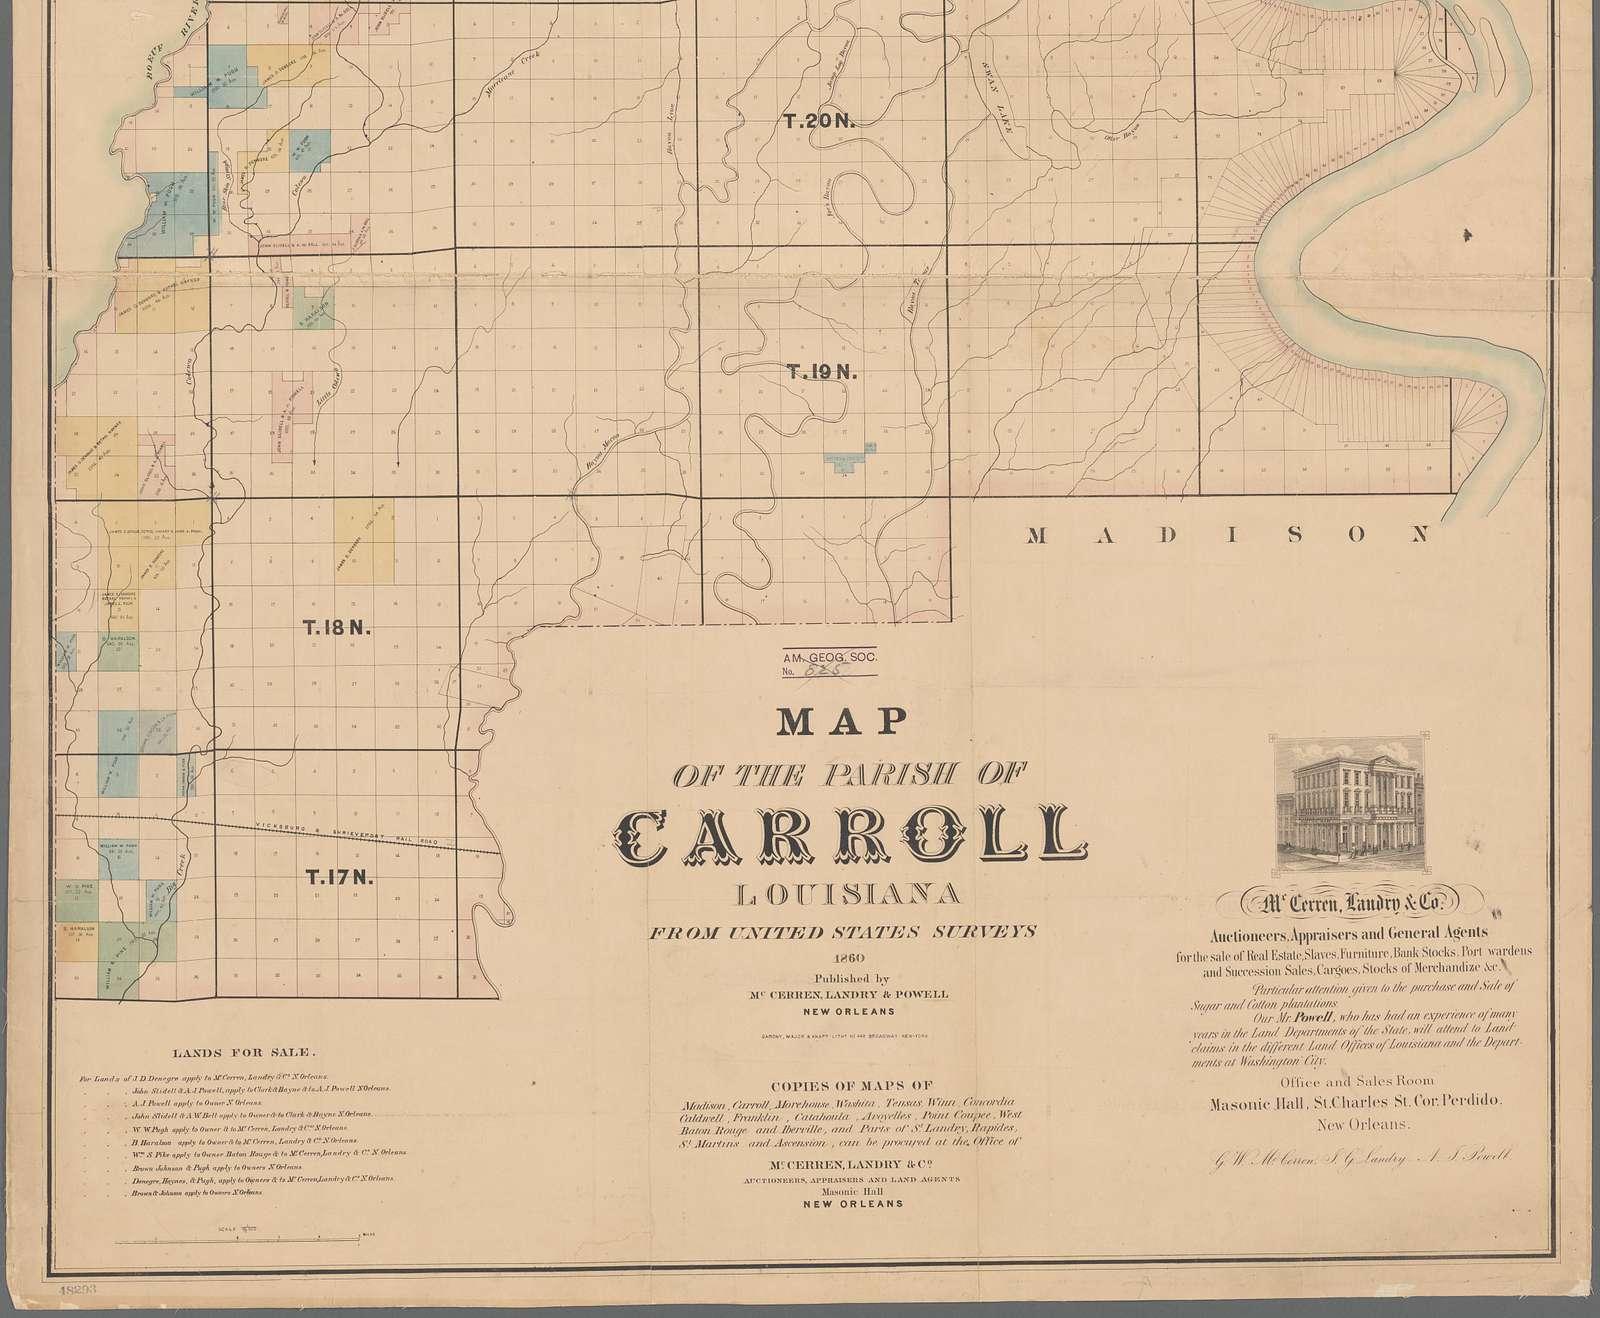 Map of the Parish of Carroll, Louisiana : from United States surveys